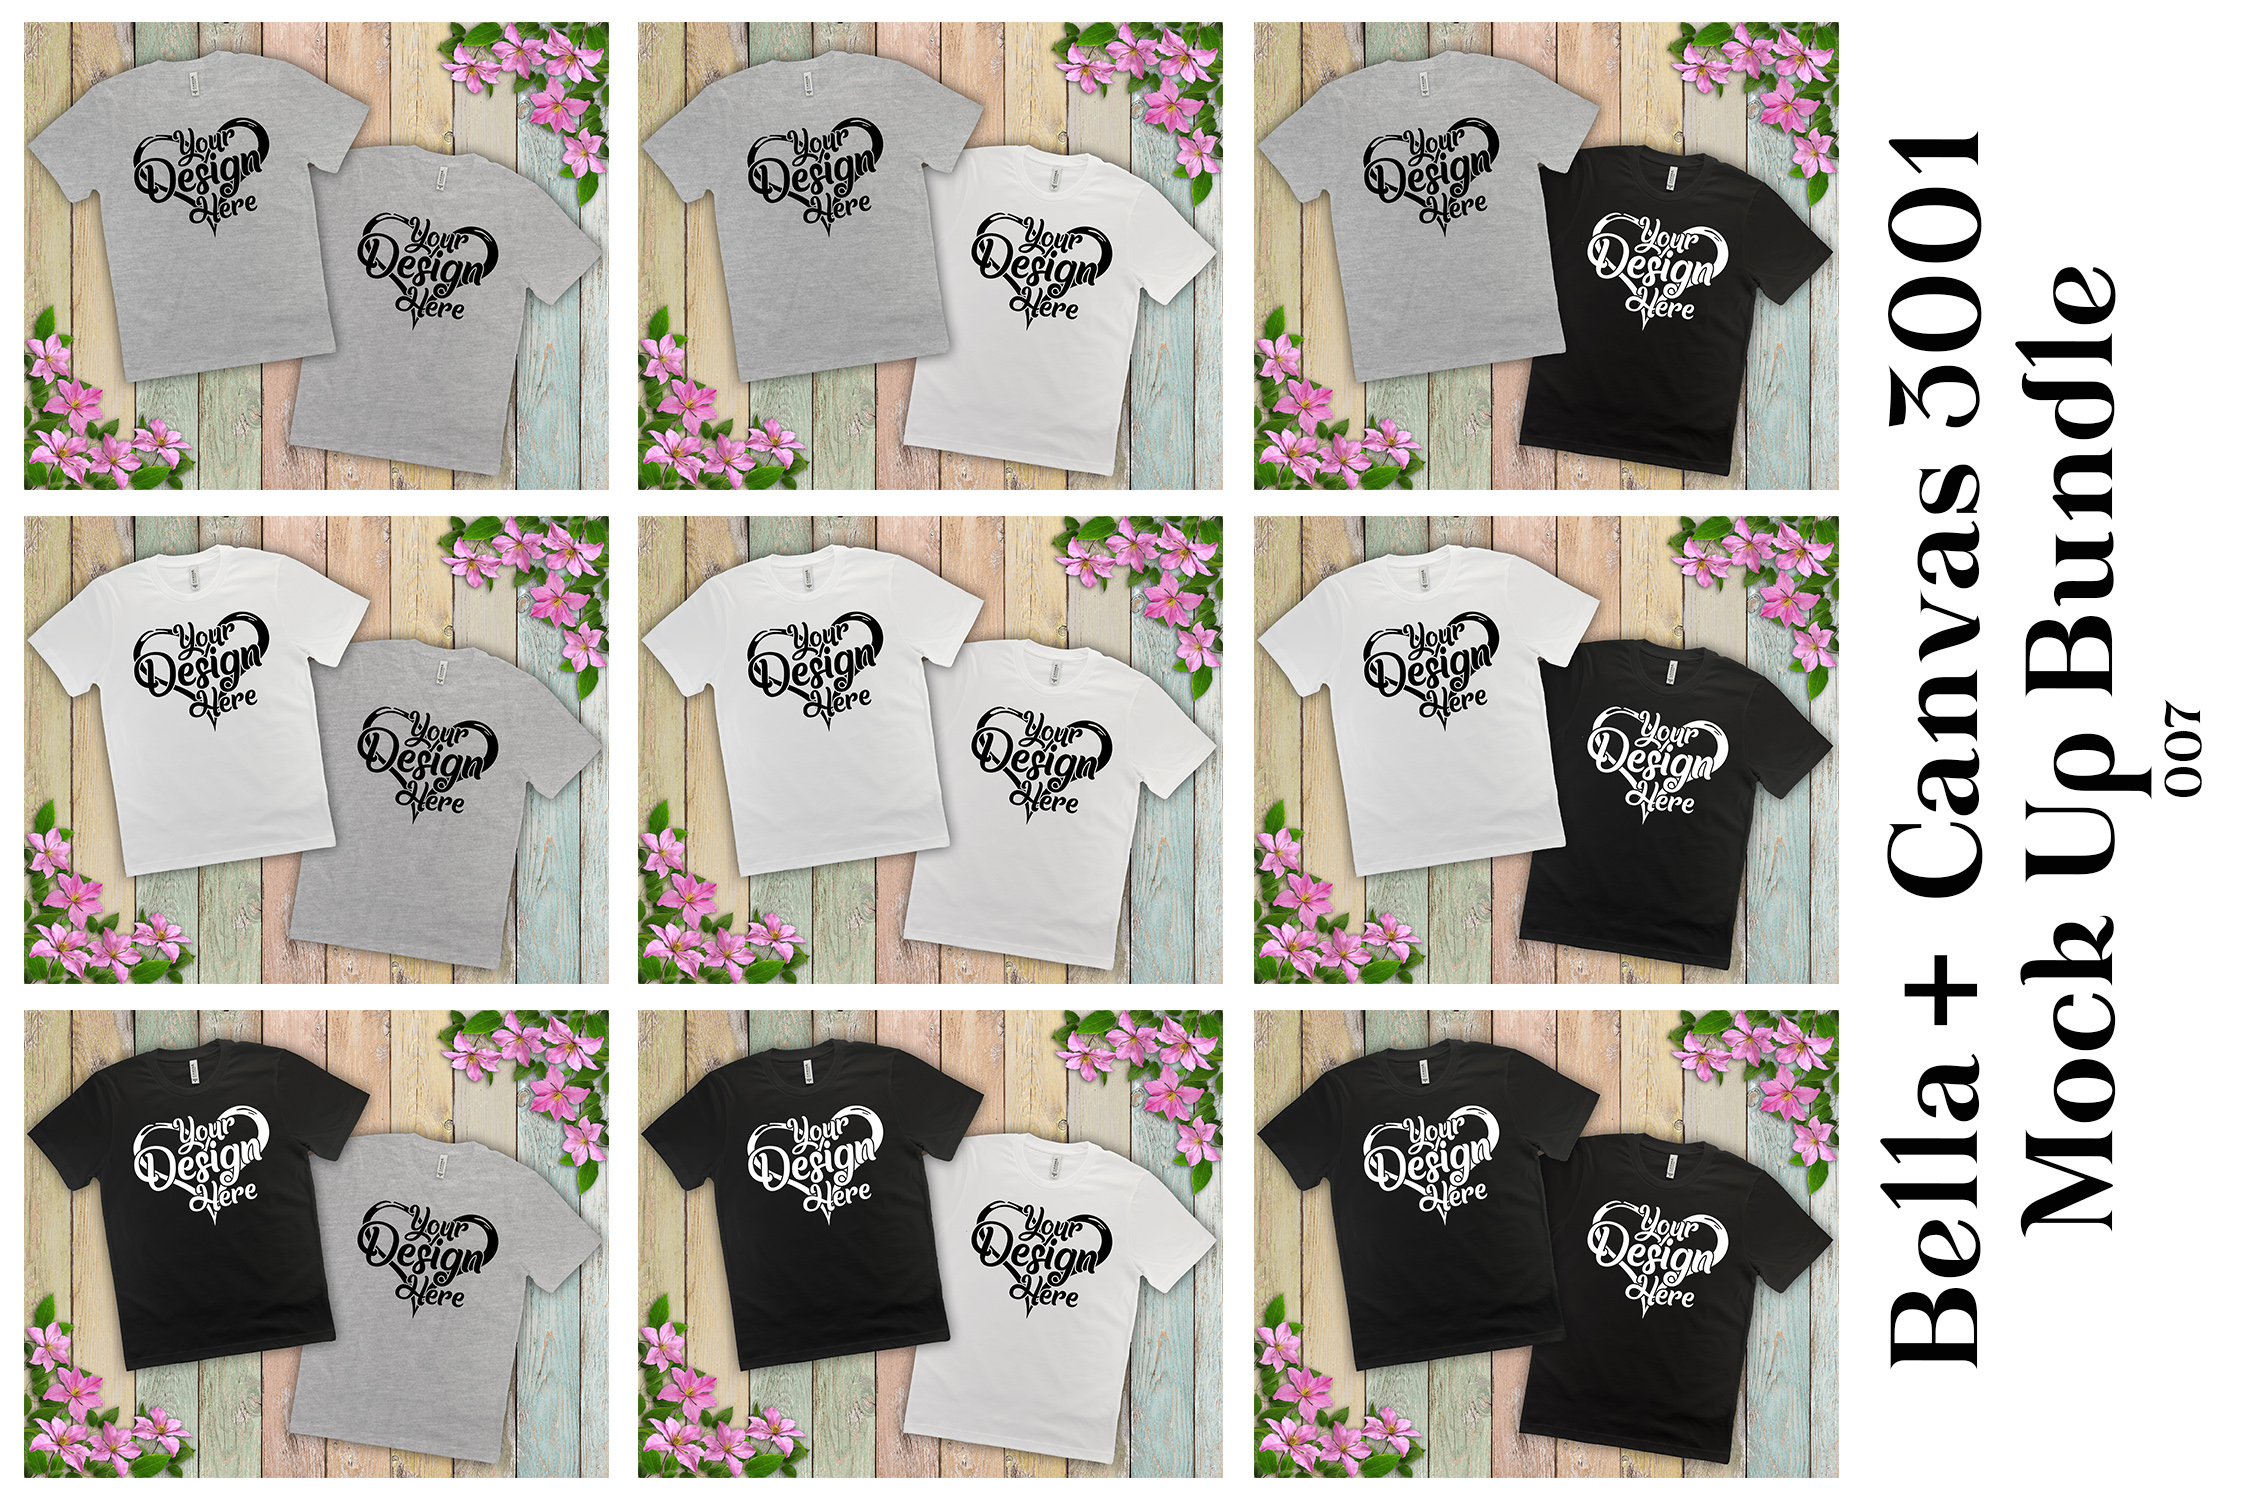 161 Bella Canvas 300 Mockups Mega Bundle Flat Lay T-Shirts example image 10